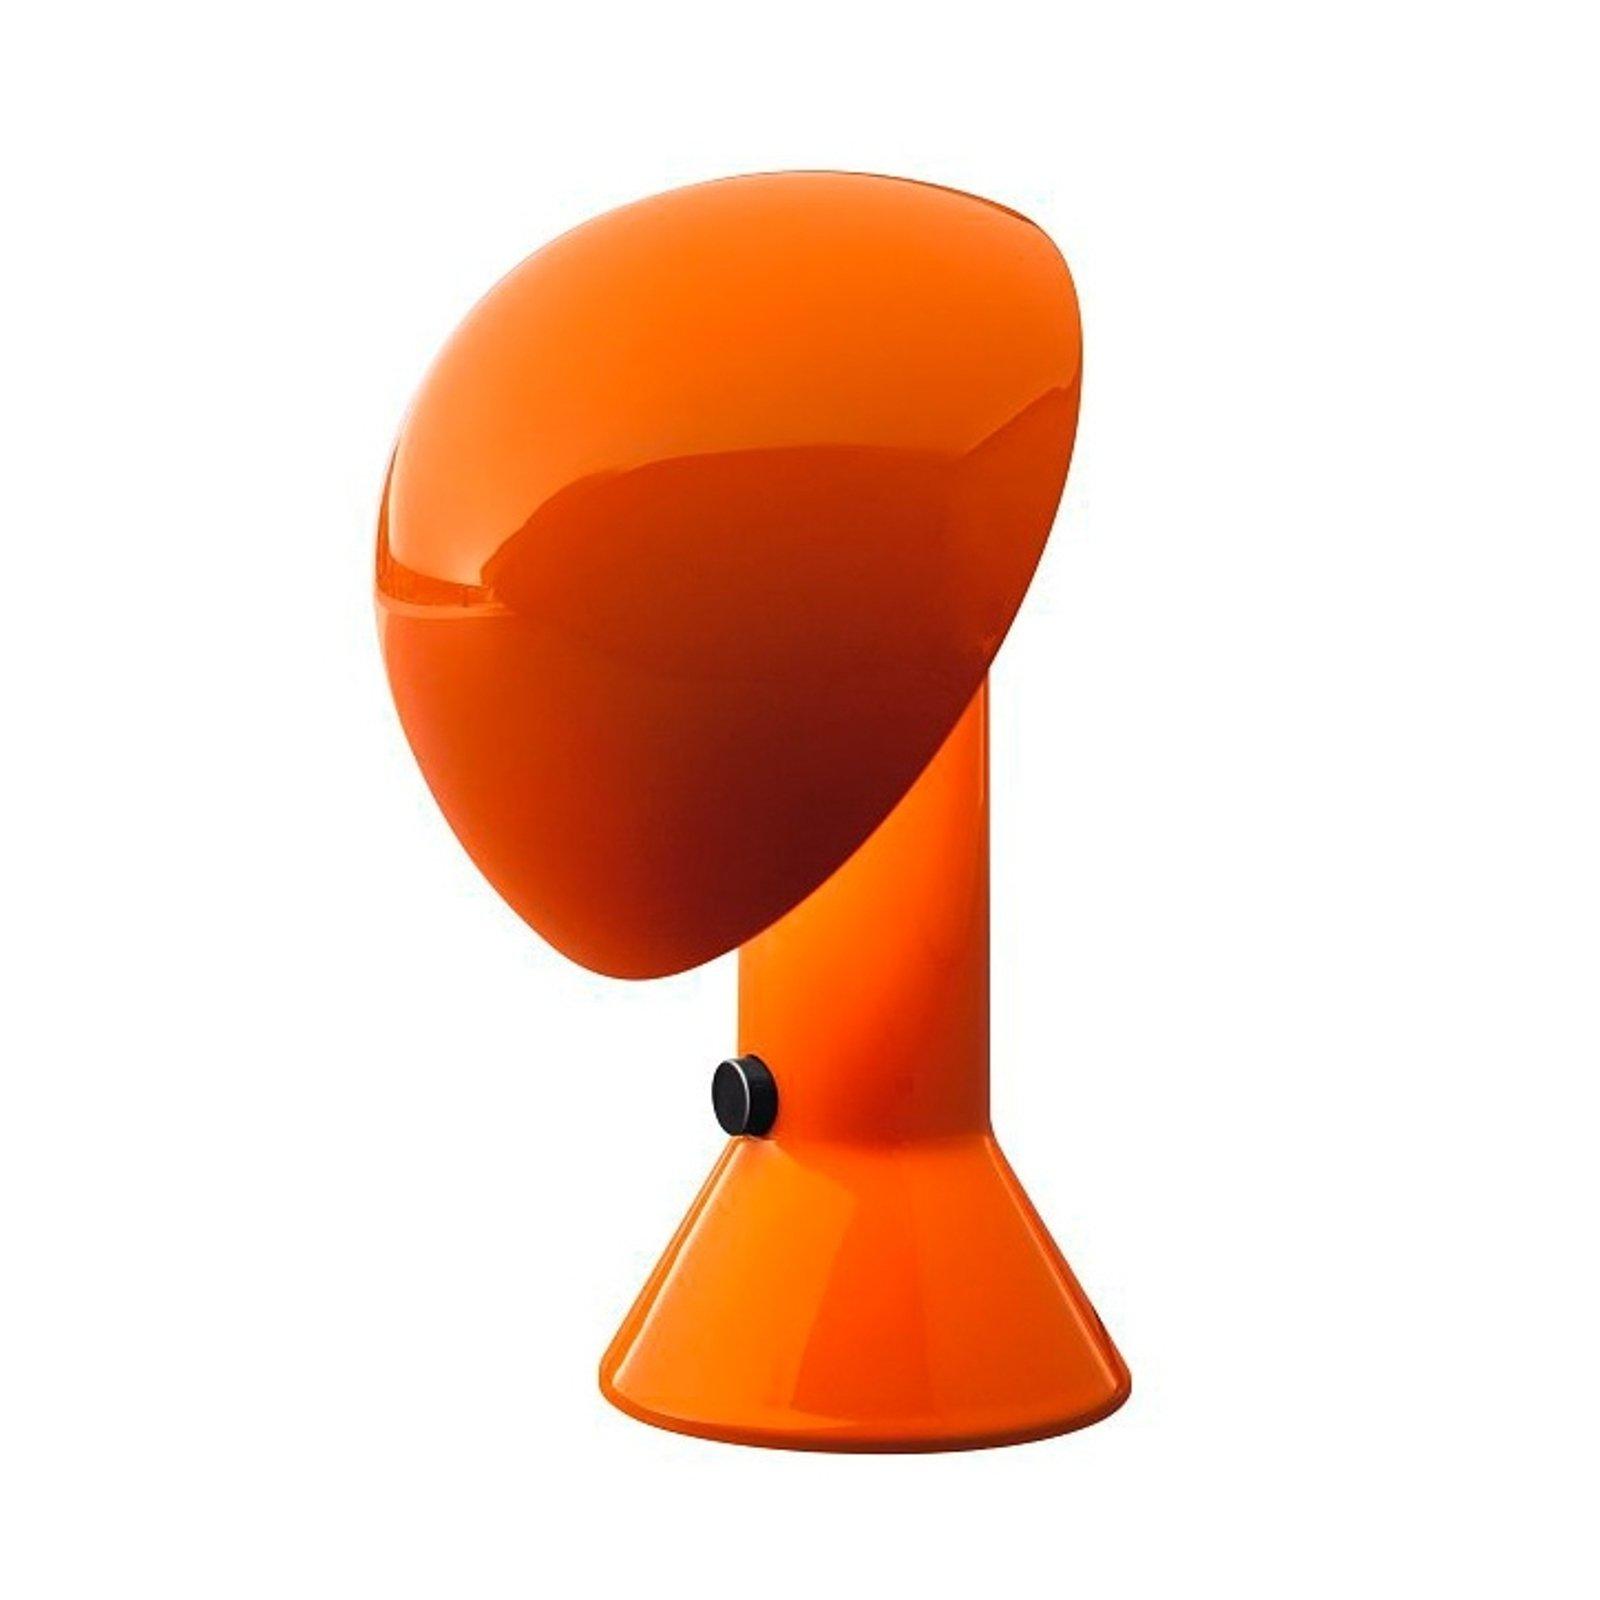 Design-bordlampe ELMETTO, oransje